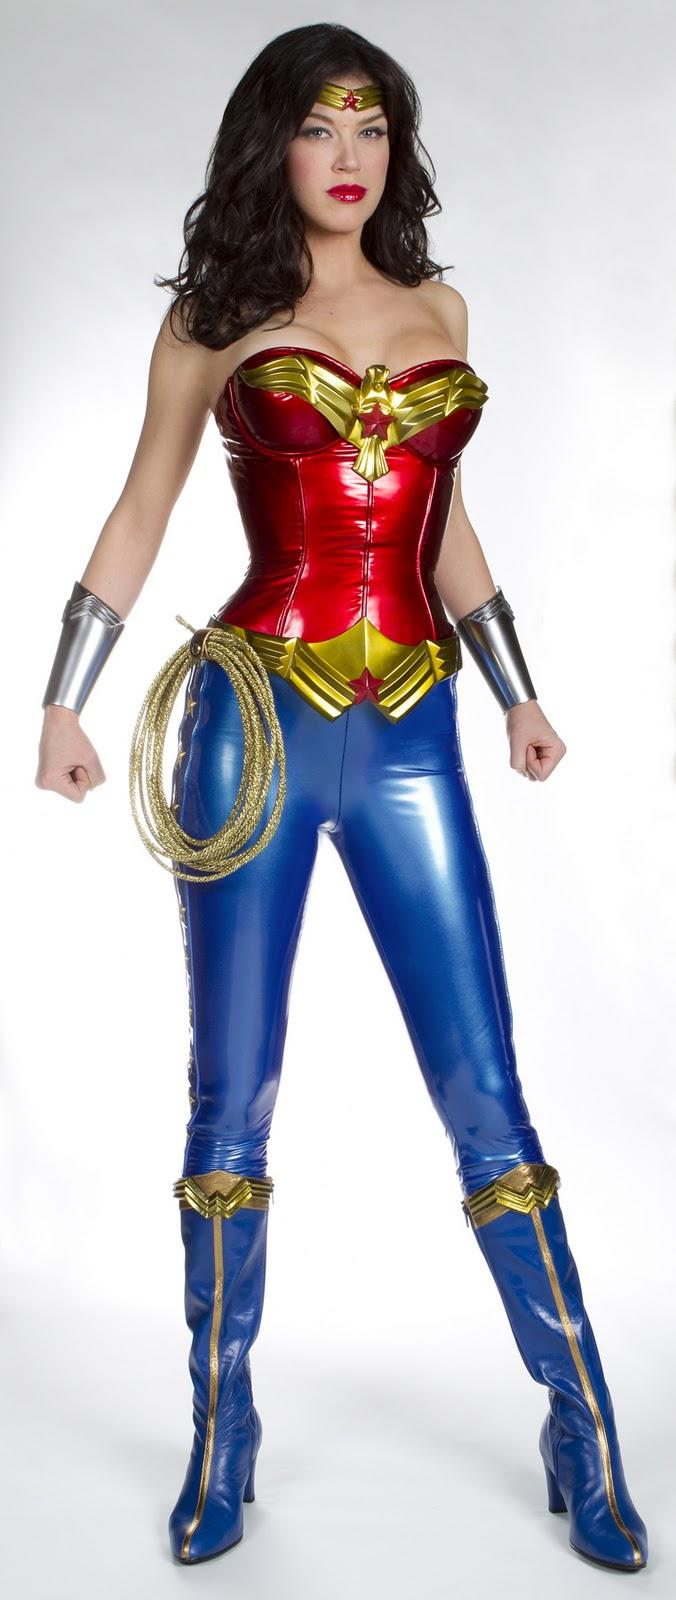 http://1.bp.blogspot.com/-4FNZdlRNYMU/ToO8XGl1_oI/AAAAAAAABmk/oInKNDEg6LA/s1600/adrianne-palicki-wonder-woman-costume-image-01.jpg